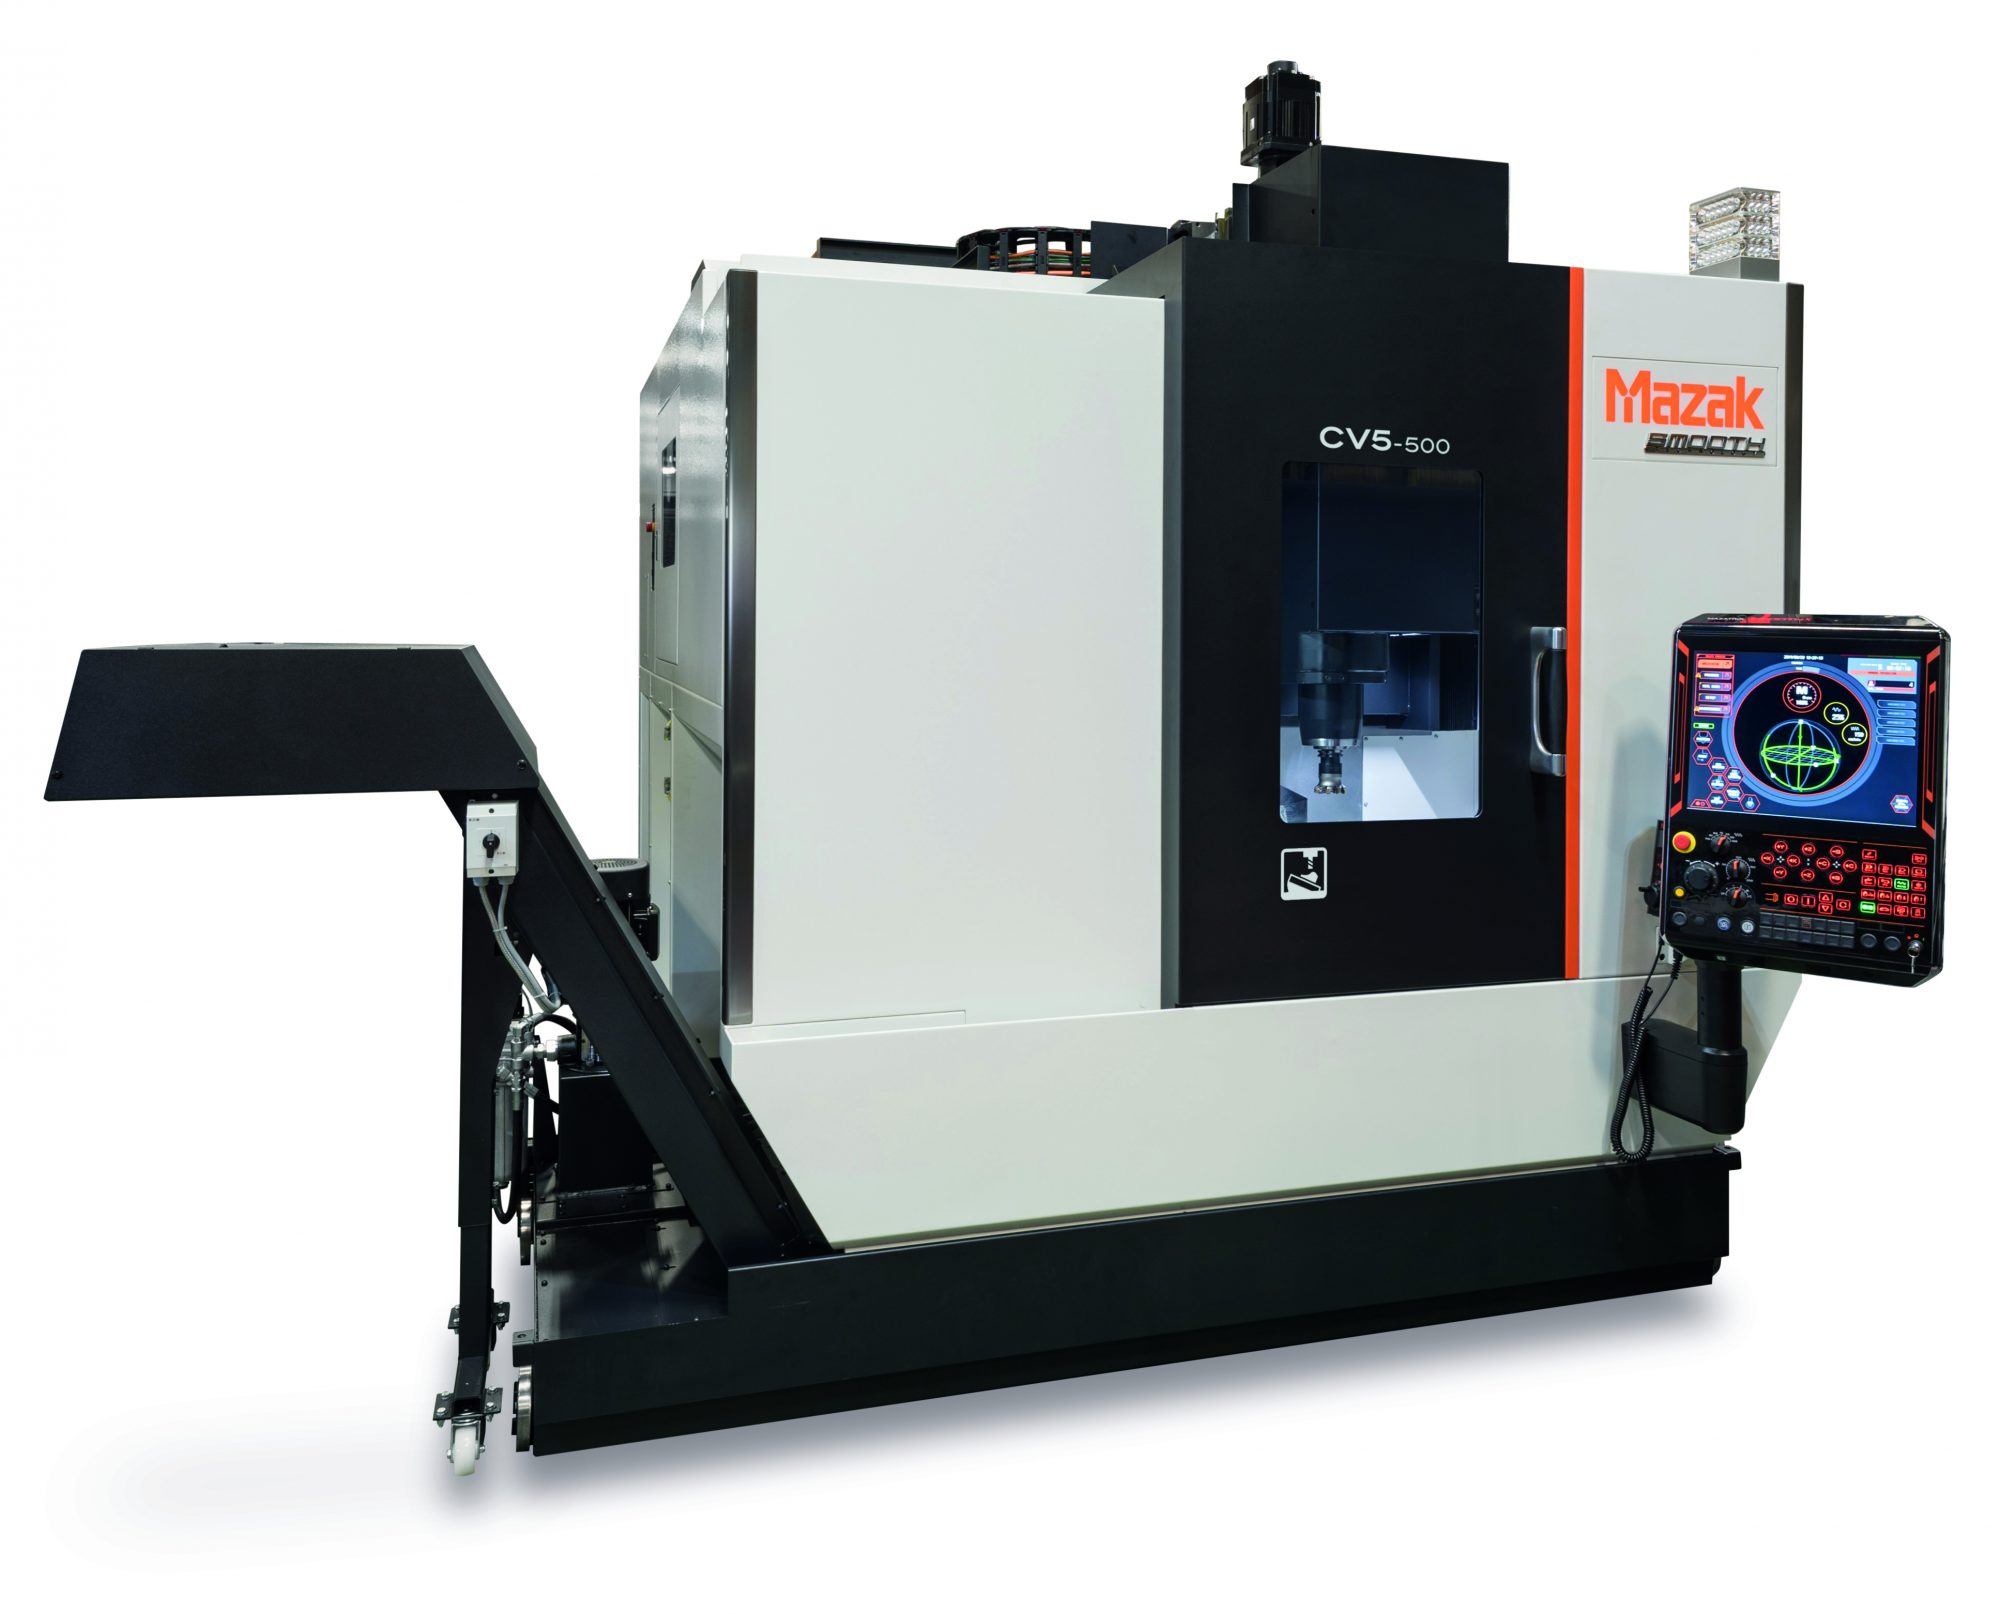 Mazak UK » CV5 500 » PP Control & Automation